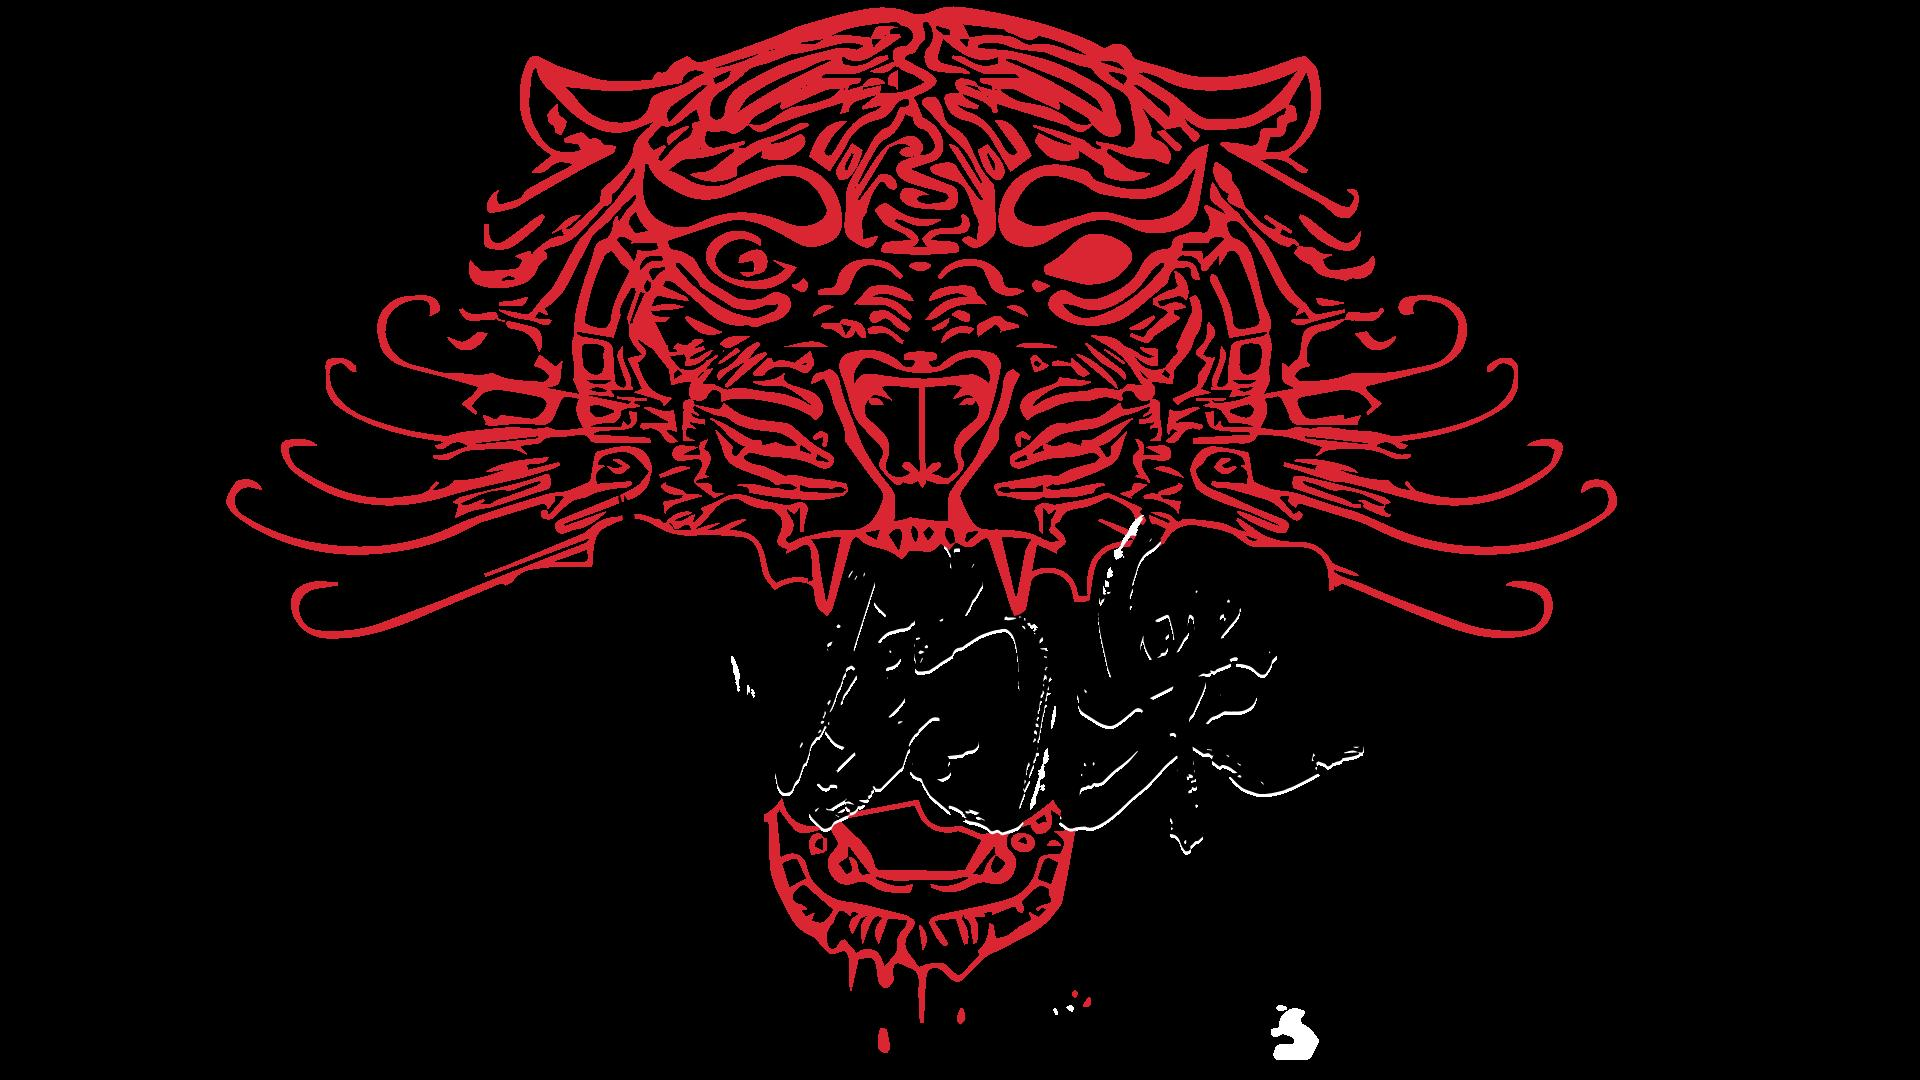 Logos de gangs Cyberpunk 2077 - Tyger Claw